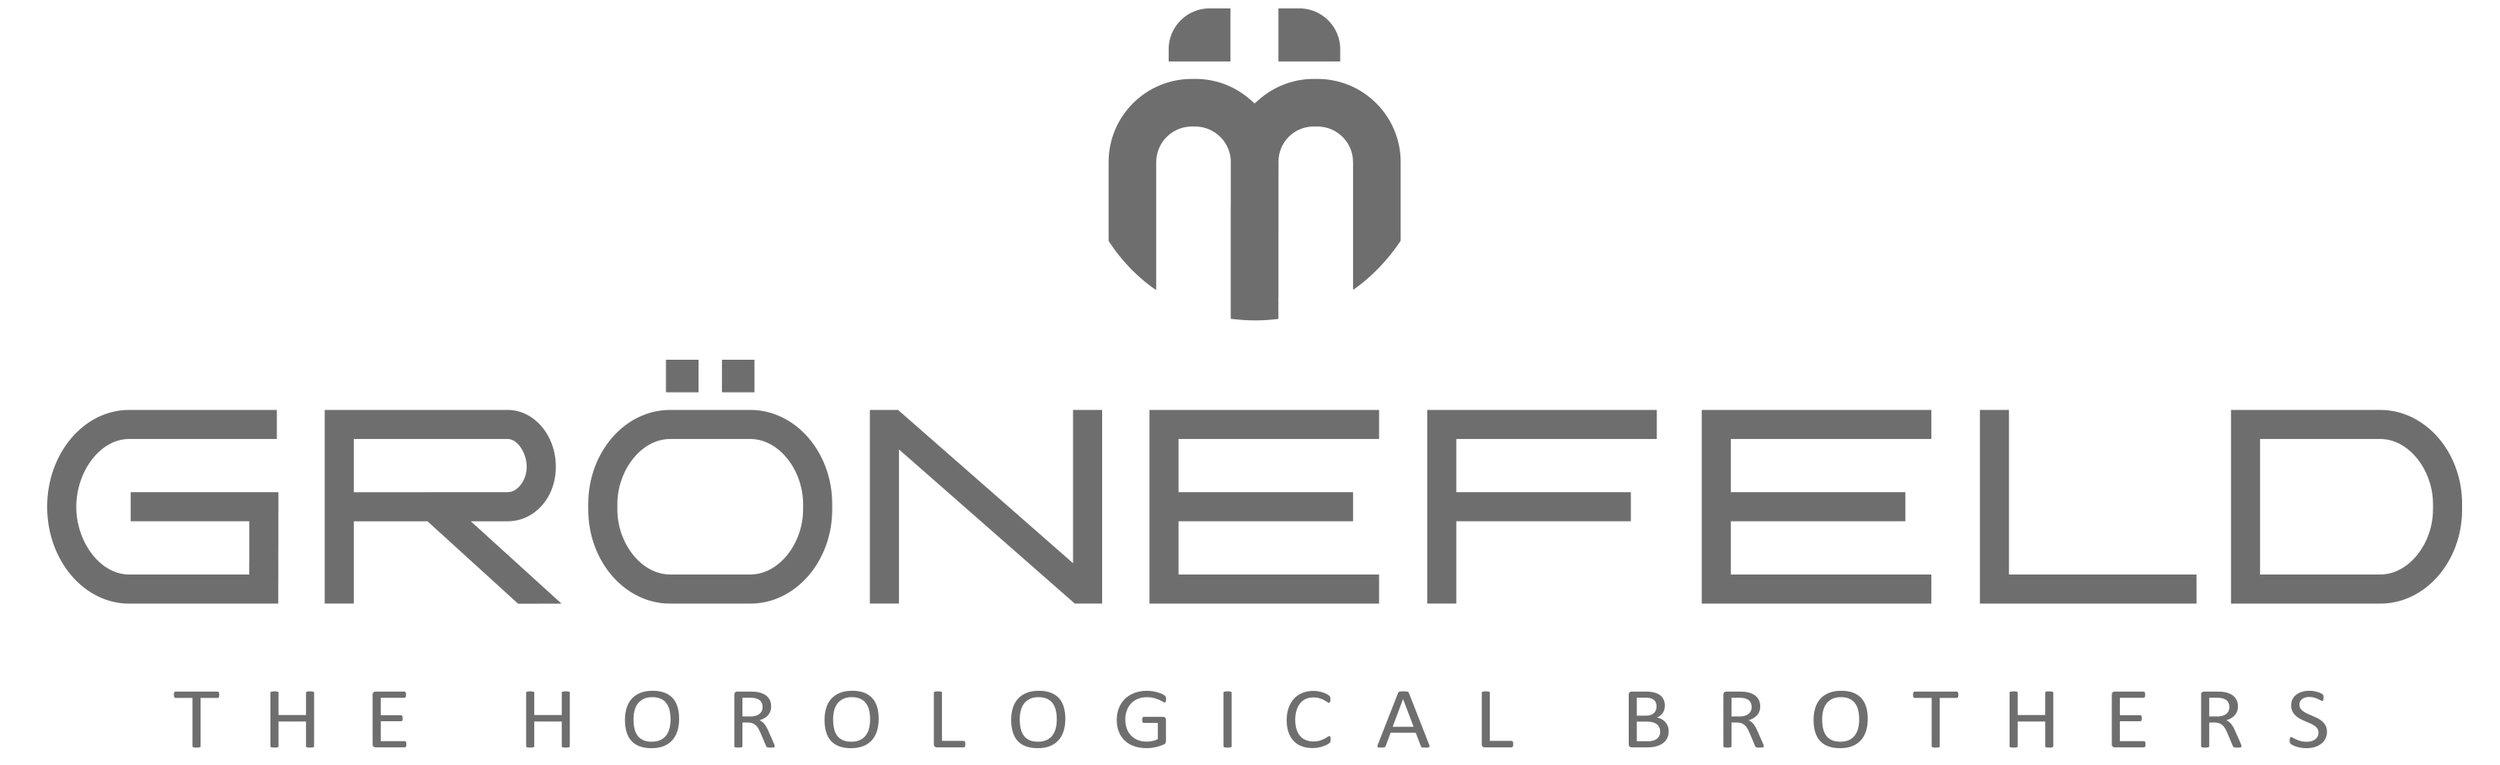 grönefeld.logo.jpg